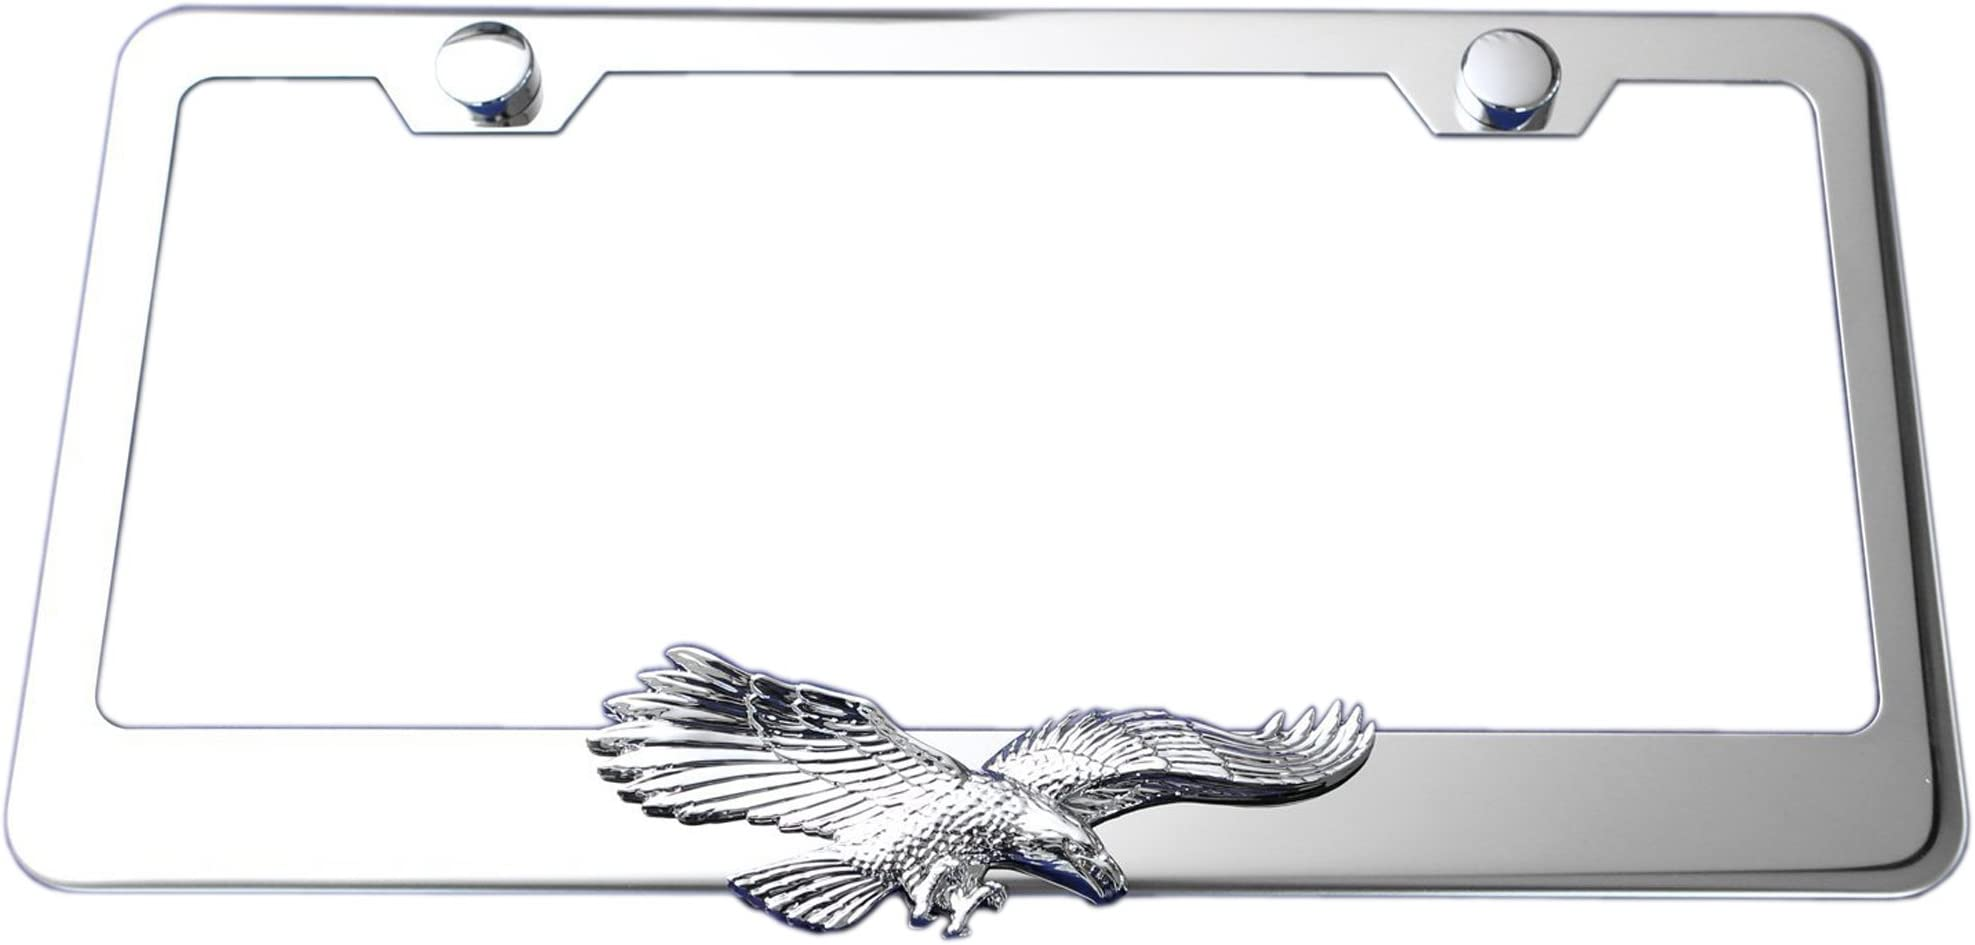 eagles never flock they sore alone chrome license plate frame usa made